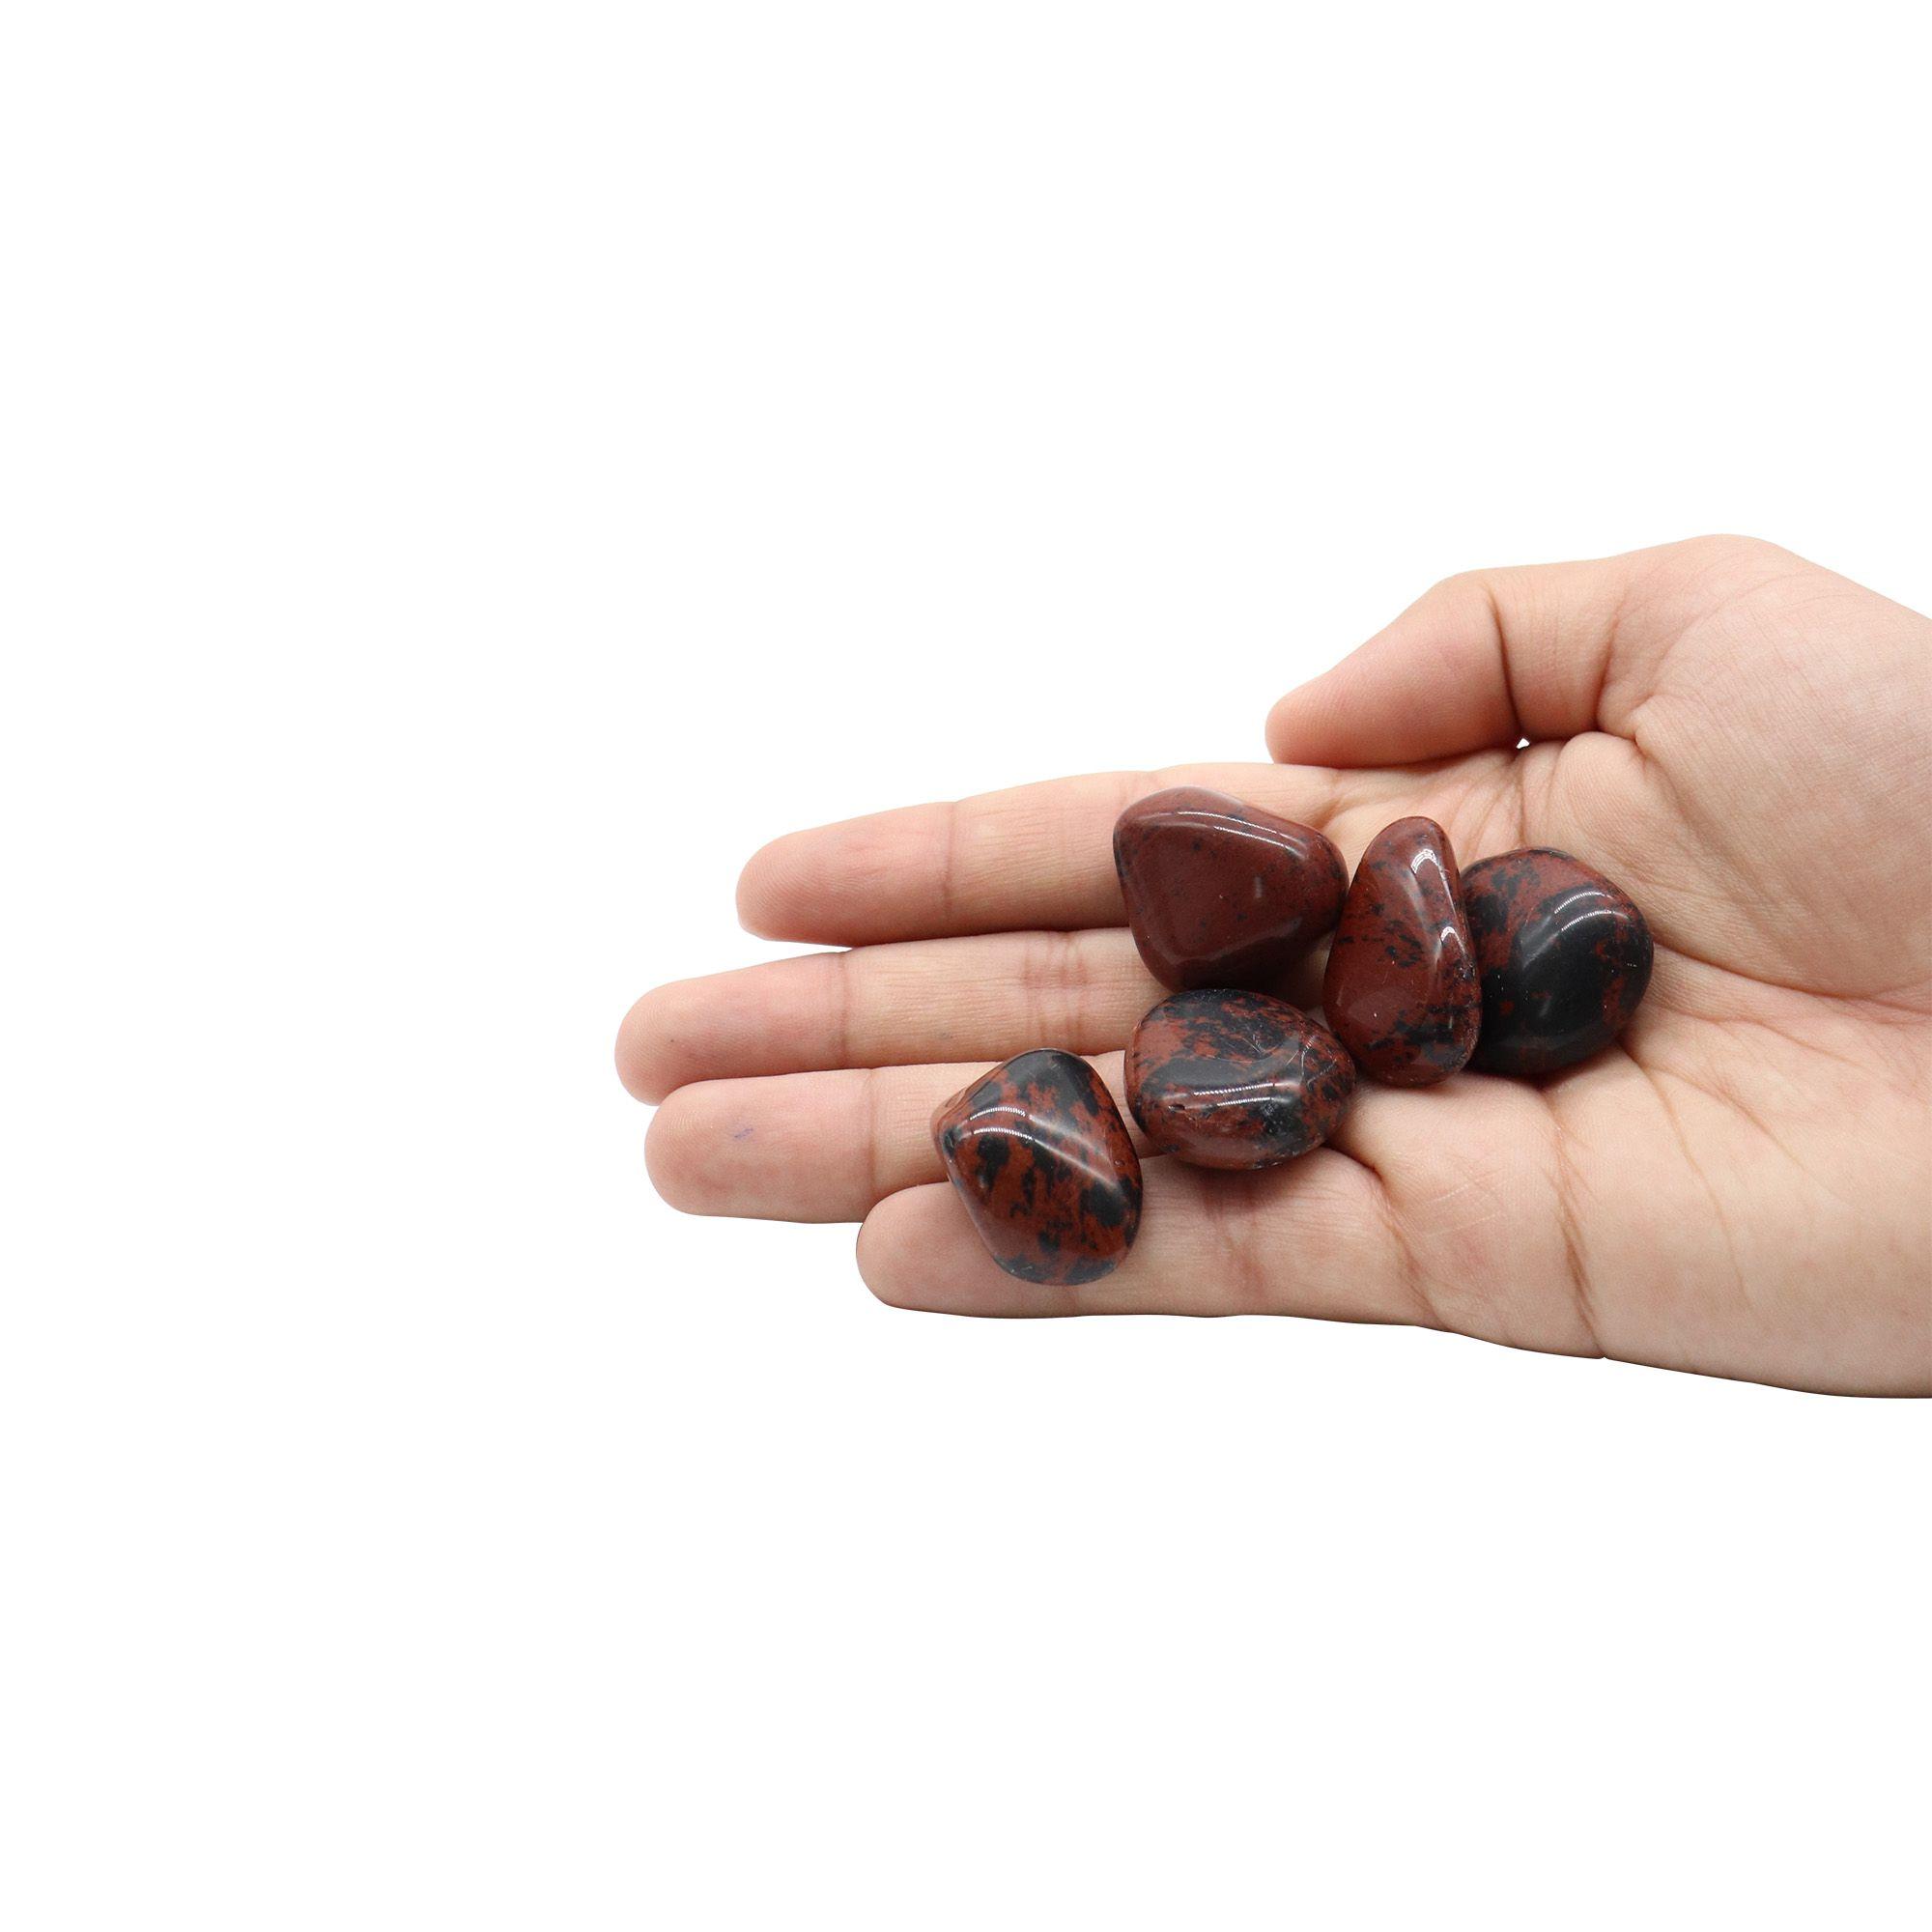 Kit com 5 pedras Obsidiana maragony ~ 7 à 30g